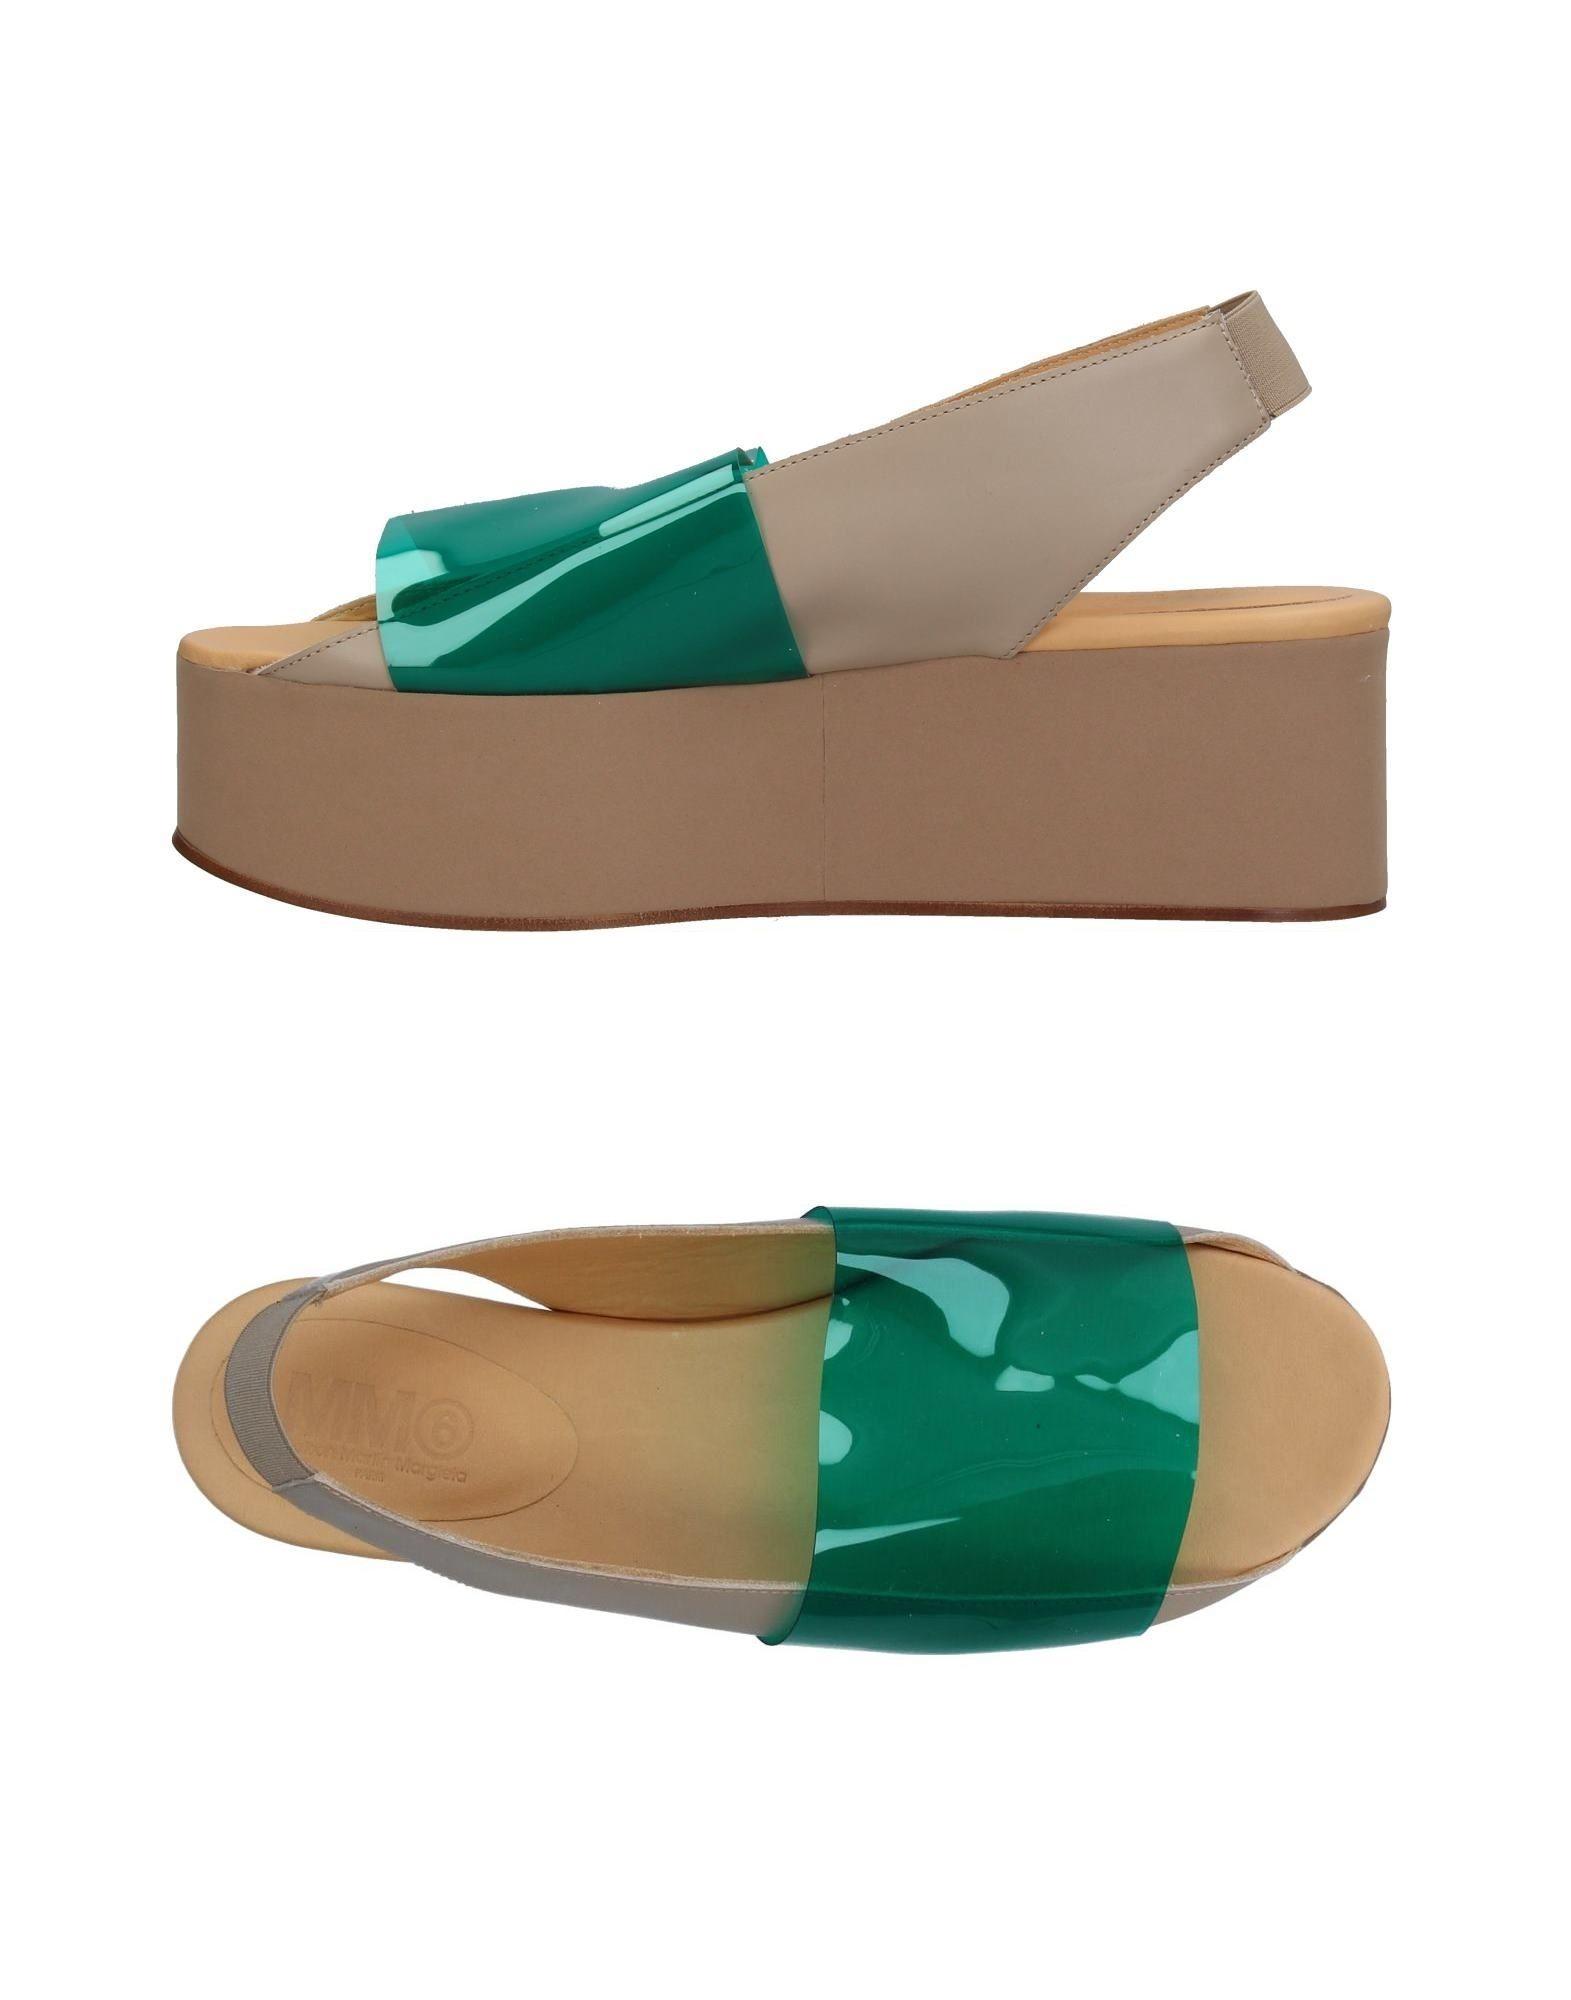 Mm6 Maison Margiela Sandalen Damen  44962691JGGut 44962691JGGut 44962691JGGut aussehende strapazierfähige Schuhe 28027f